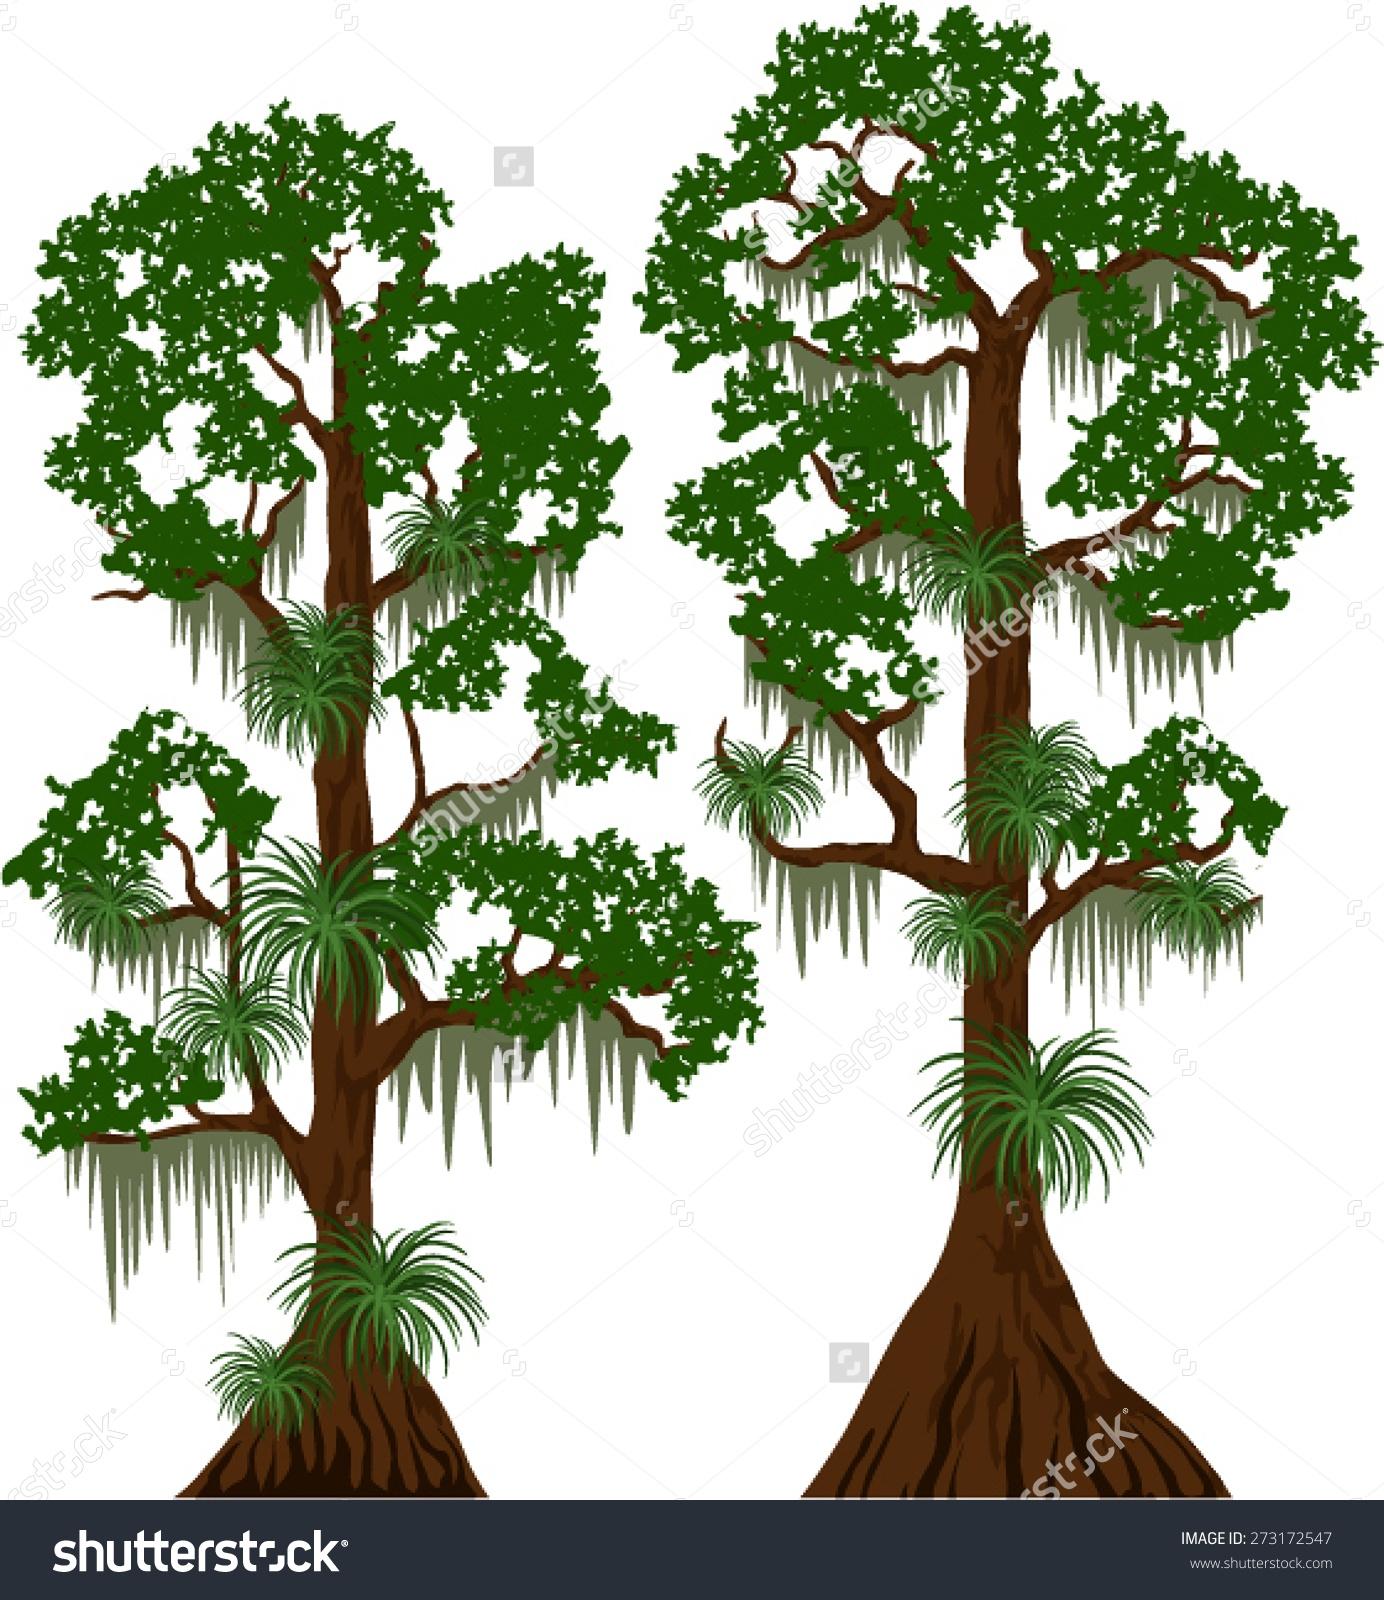 Bush clipart blackberry bush Cypress tree silhouette art clipart